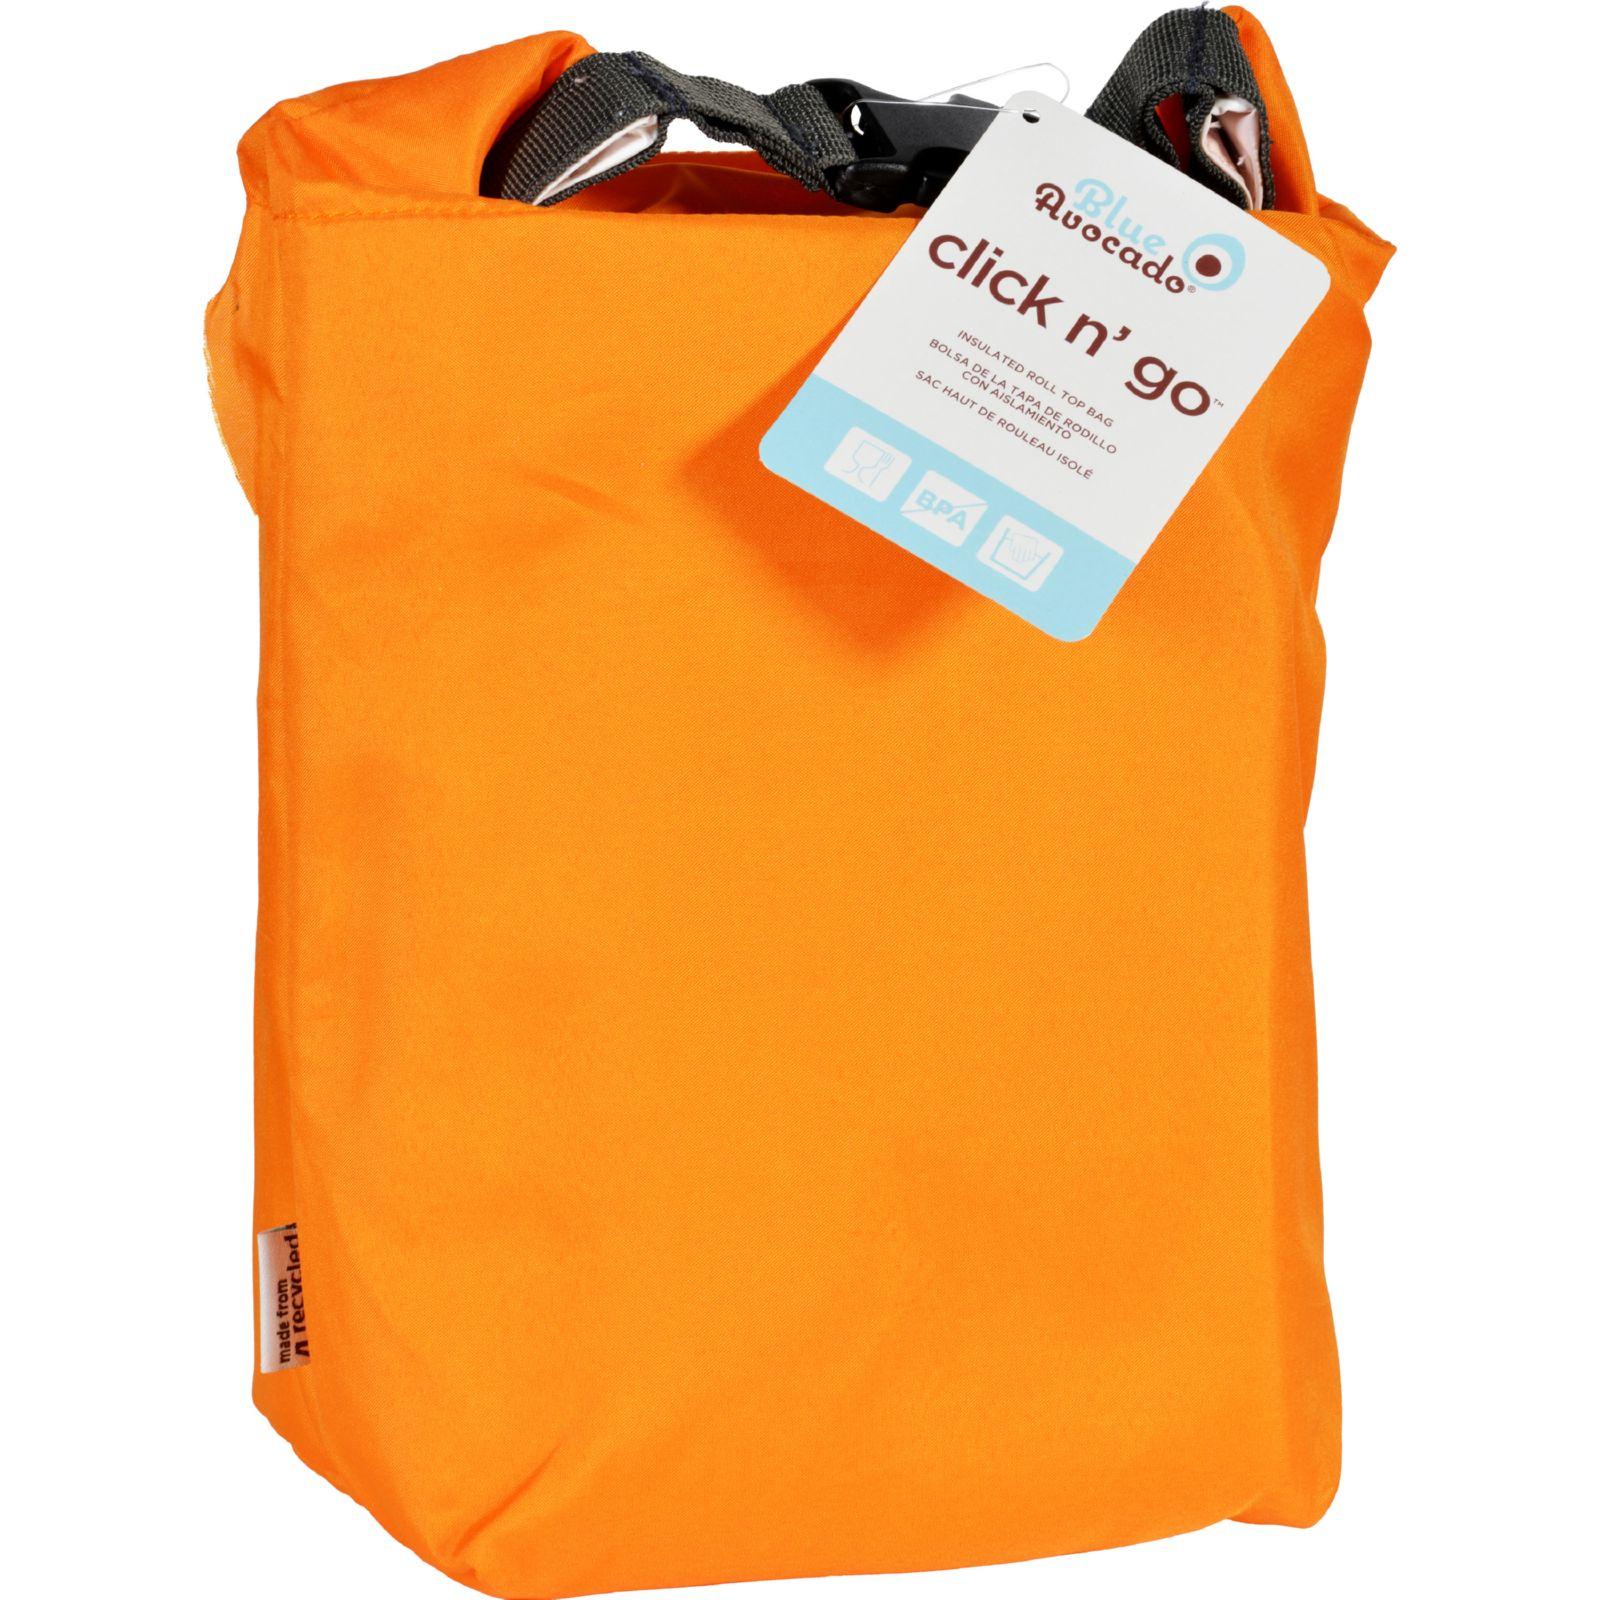 Bag - Click N Go - Orange - 1 Count